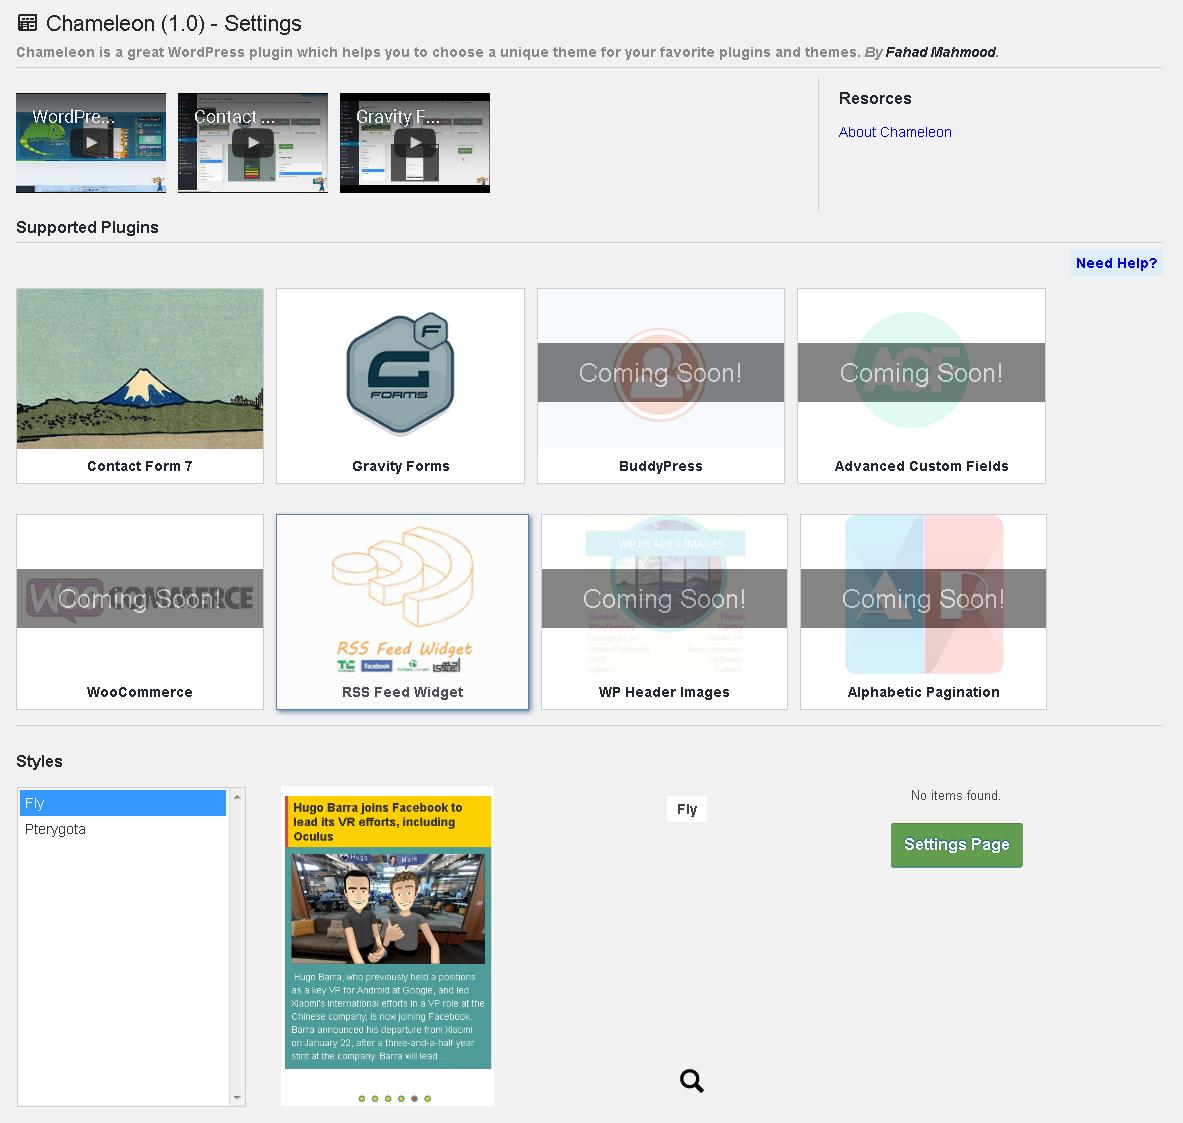 free rss feed widget for website